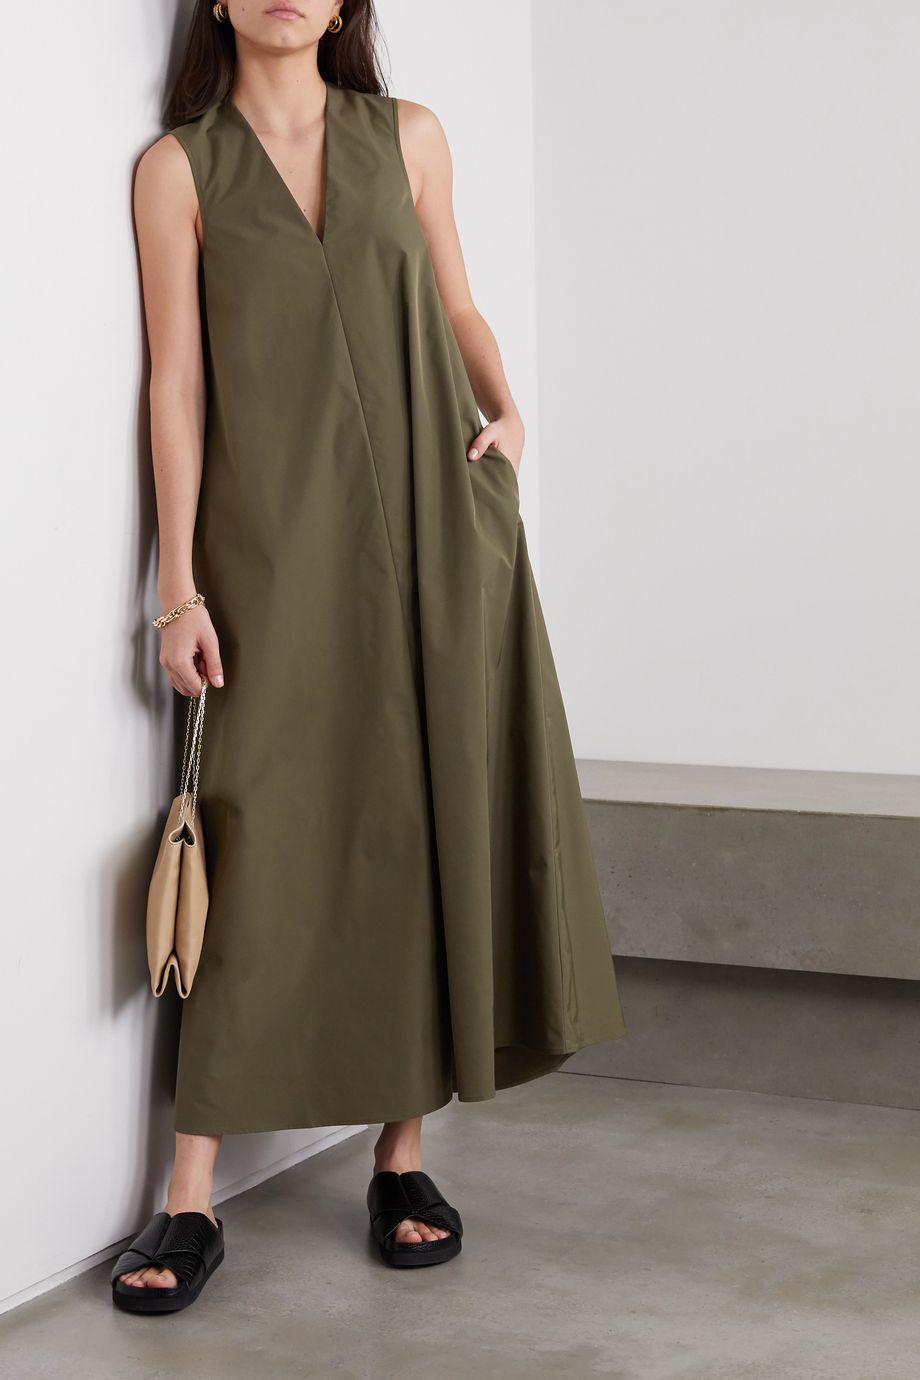 Co Woven maxi dress